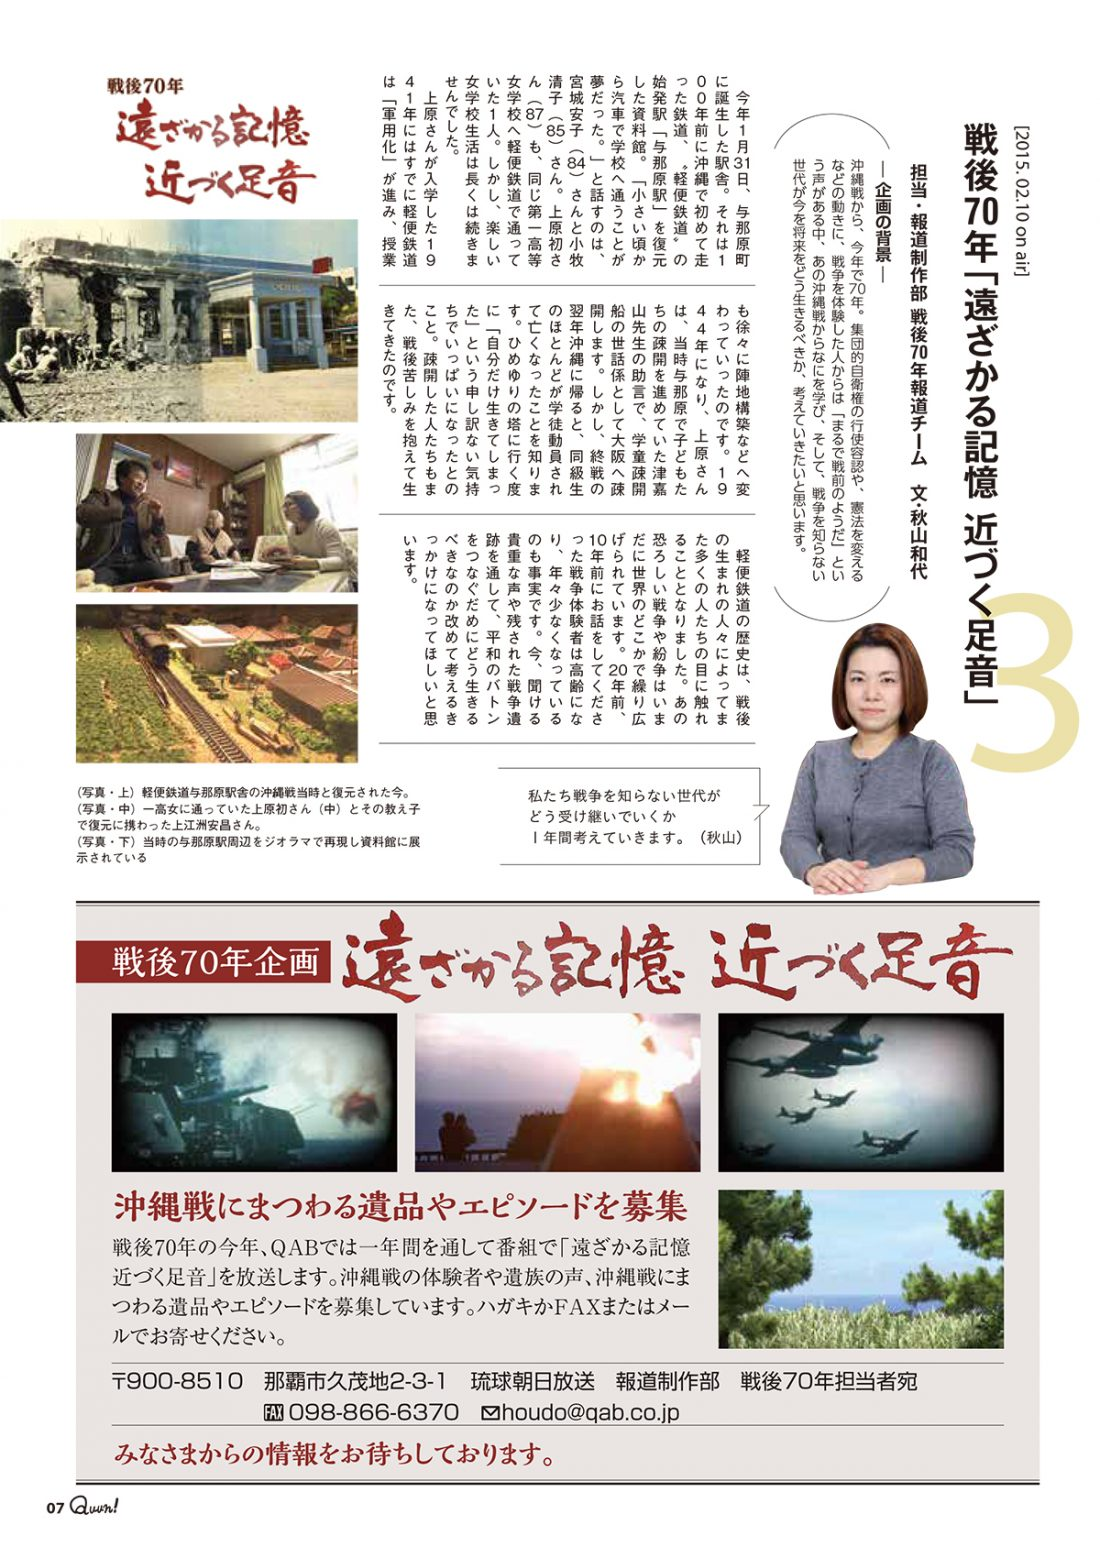 https://www.qab.co.jp/qgoro/wp-content/uploads/quun_0309-1100x1558.jpg